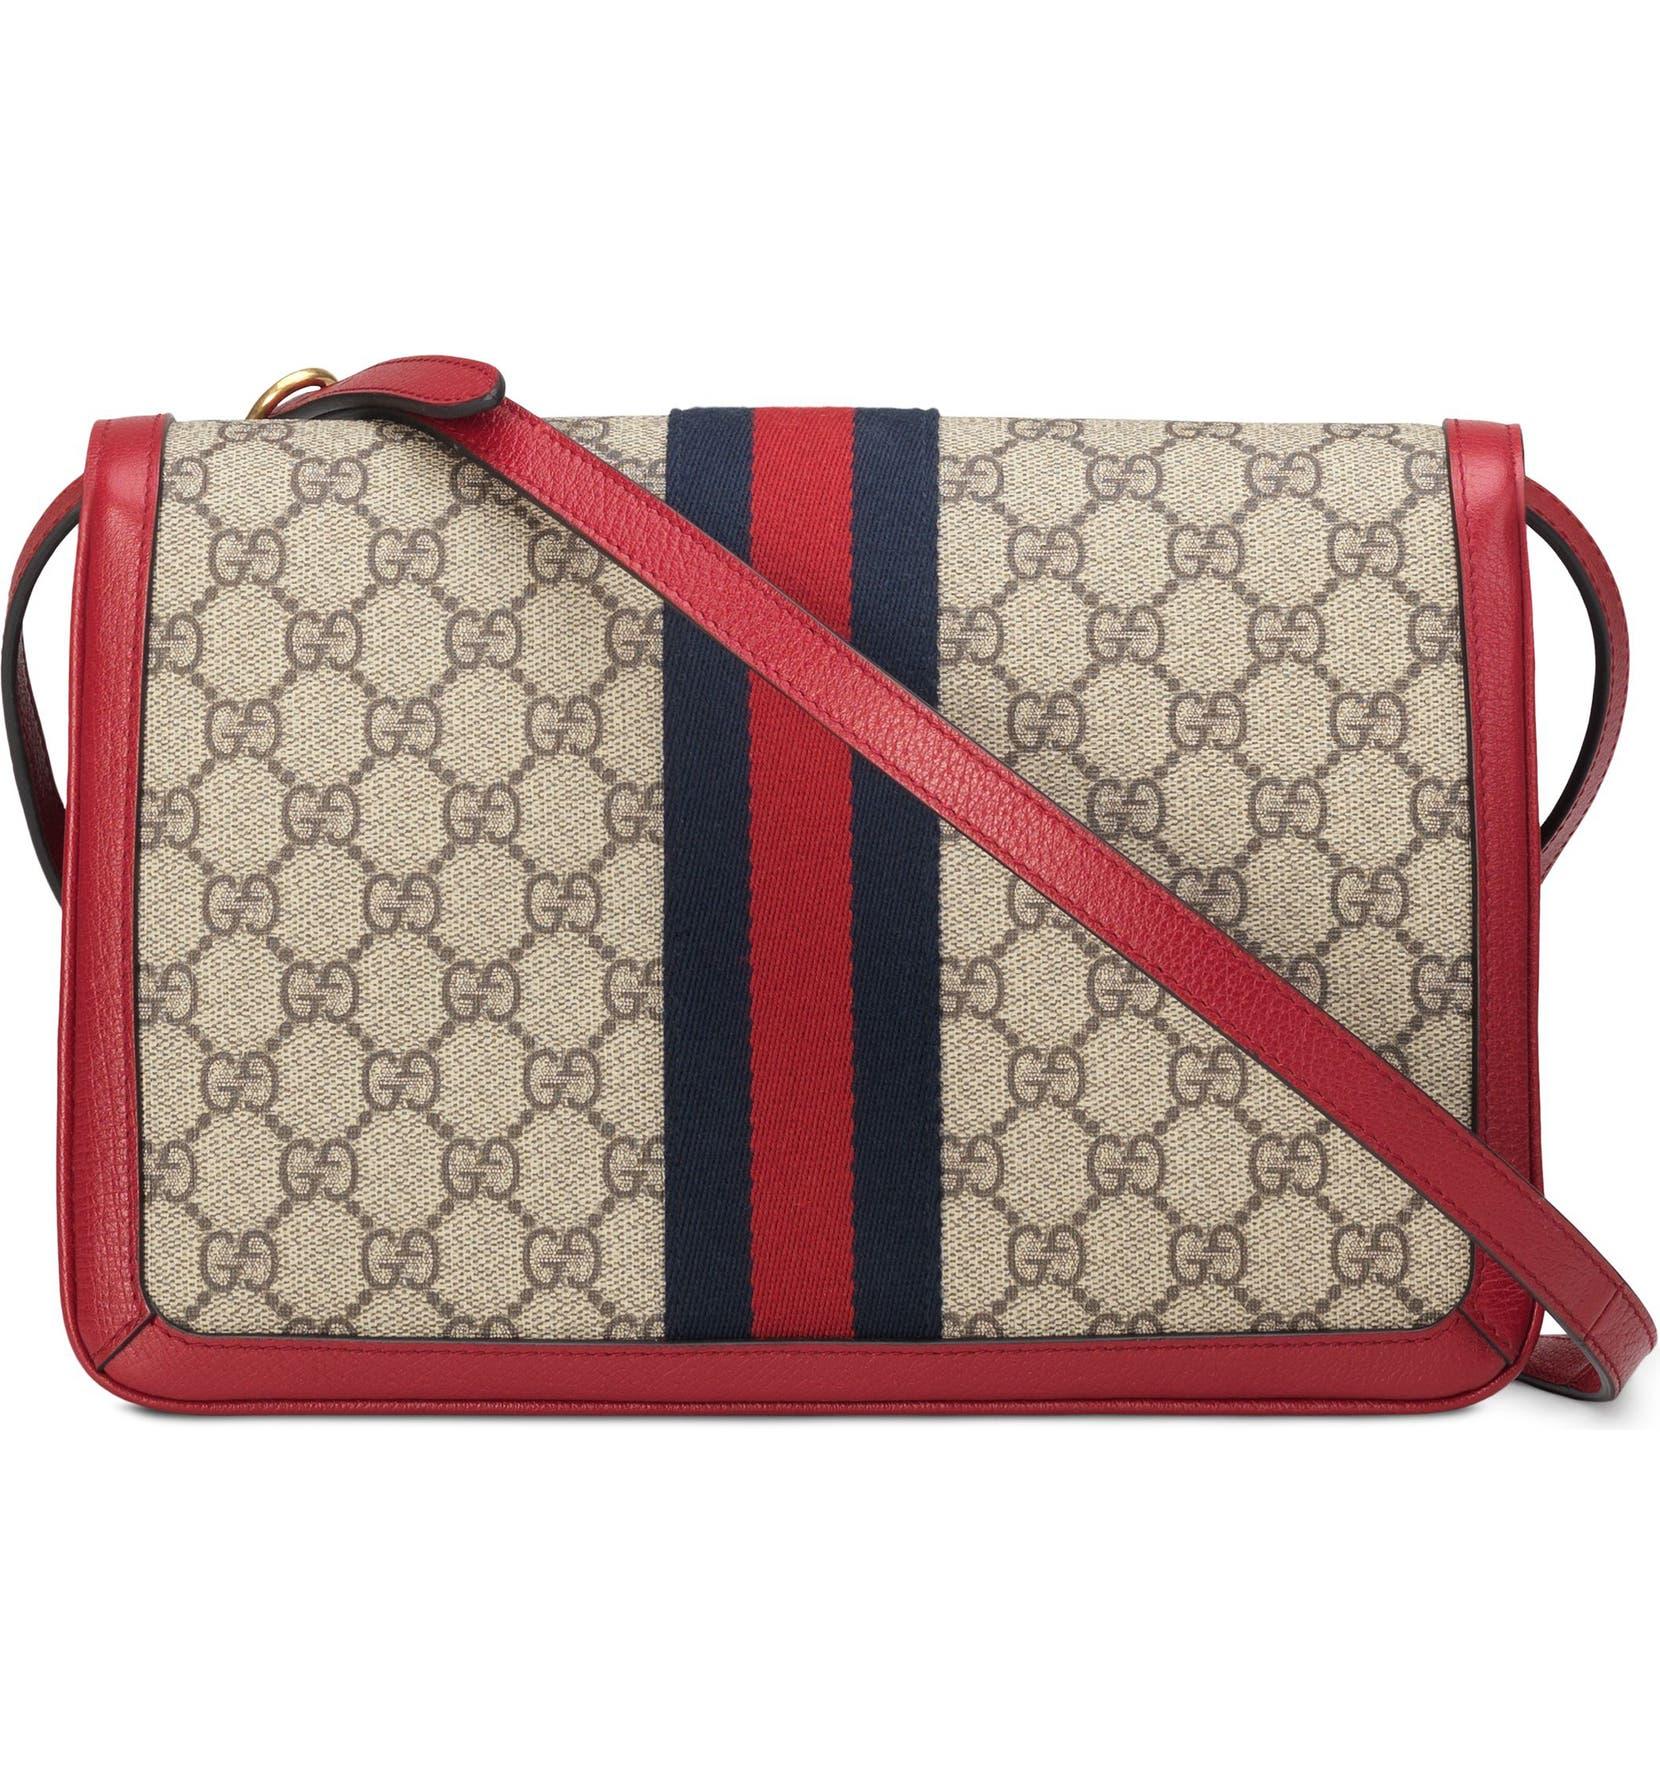 cb0964a8e6ec Gucci Queen Margaret GG Supreme Small Crossbody Bag | Nordstrom